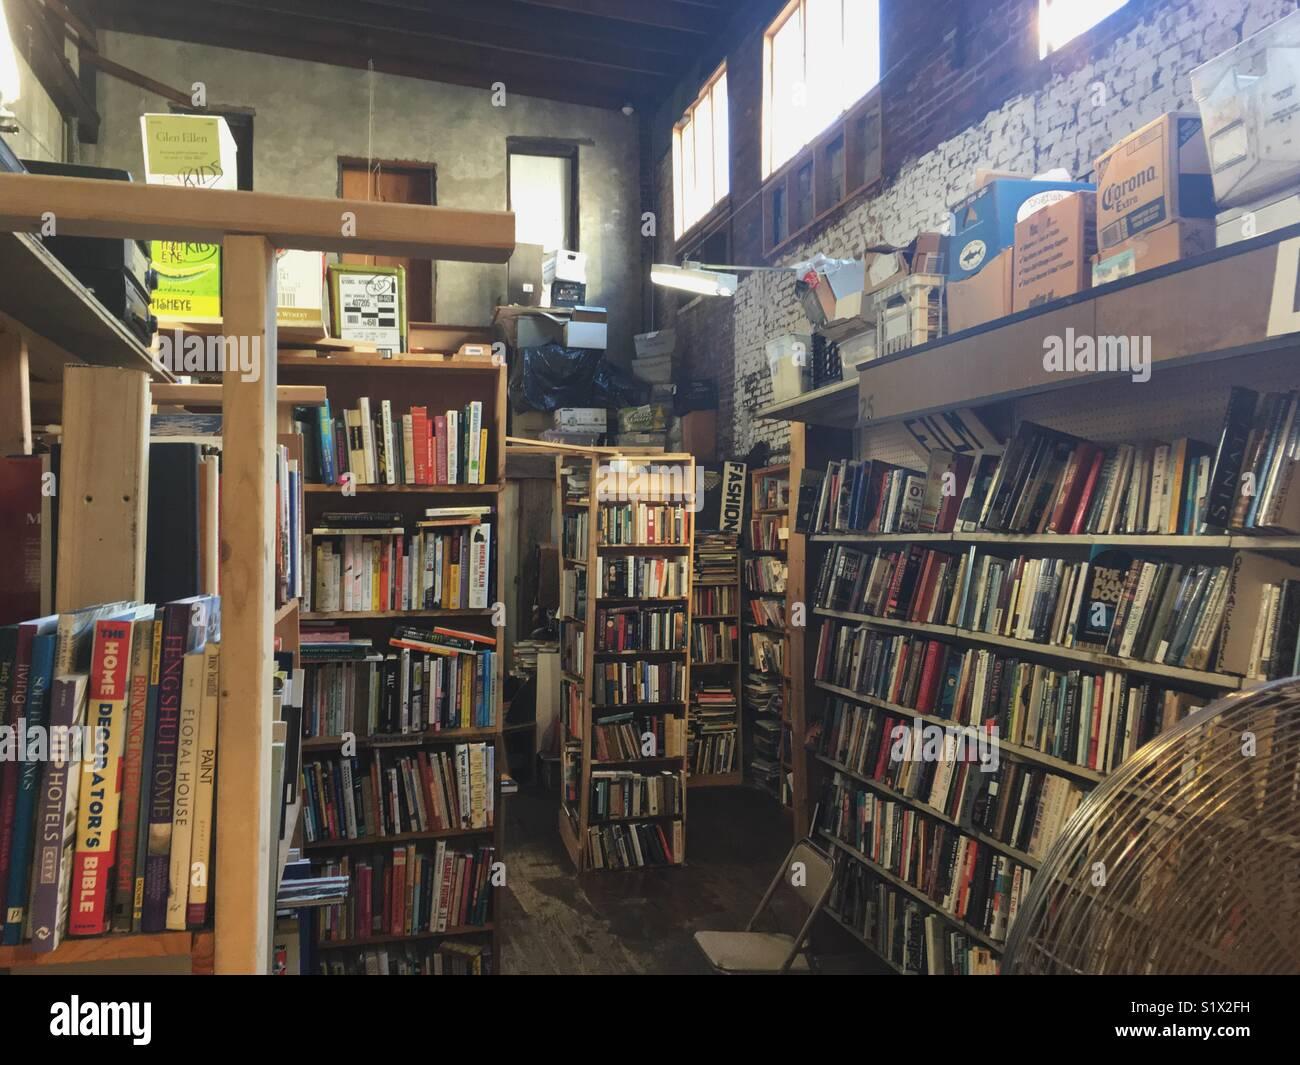 Secondhand Bookstore in Philadelphia - Stock Image